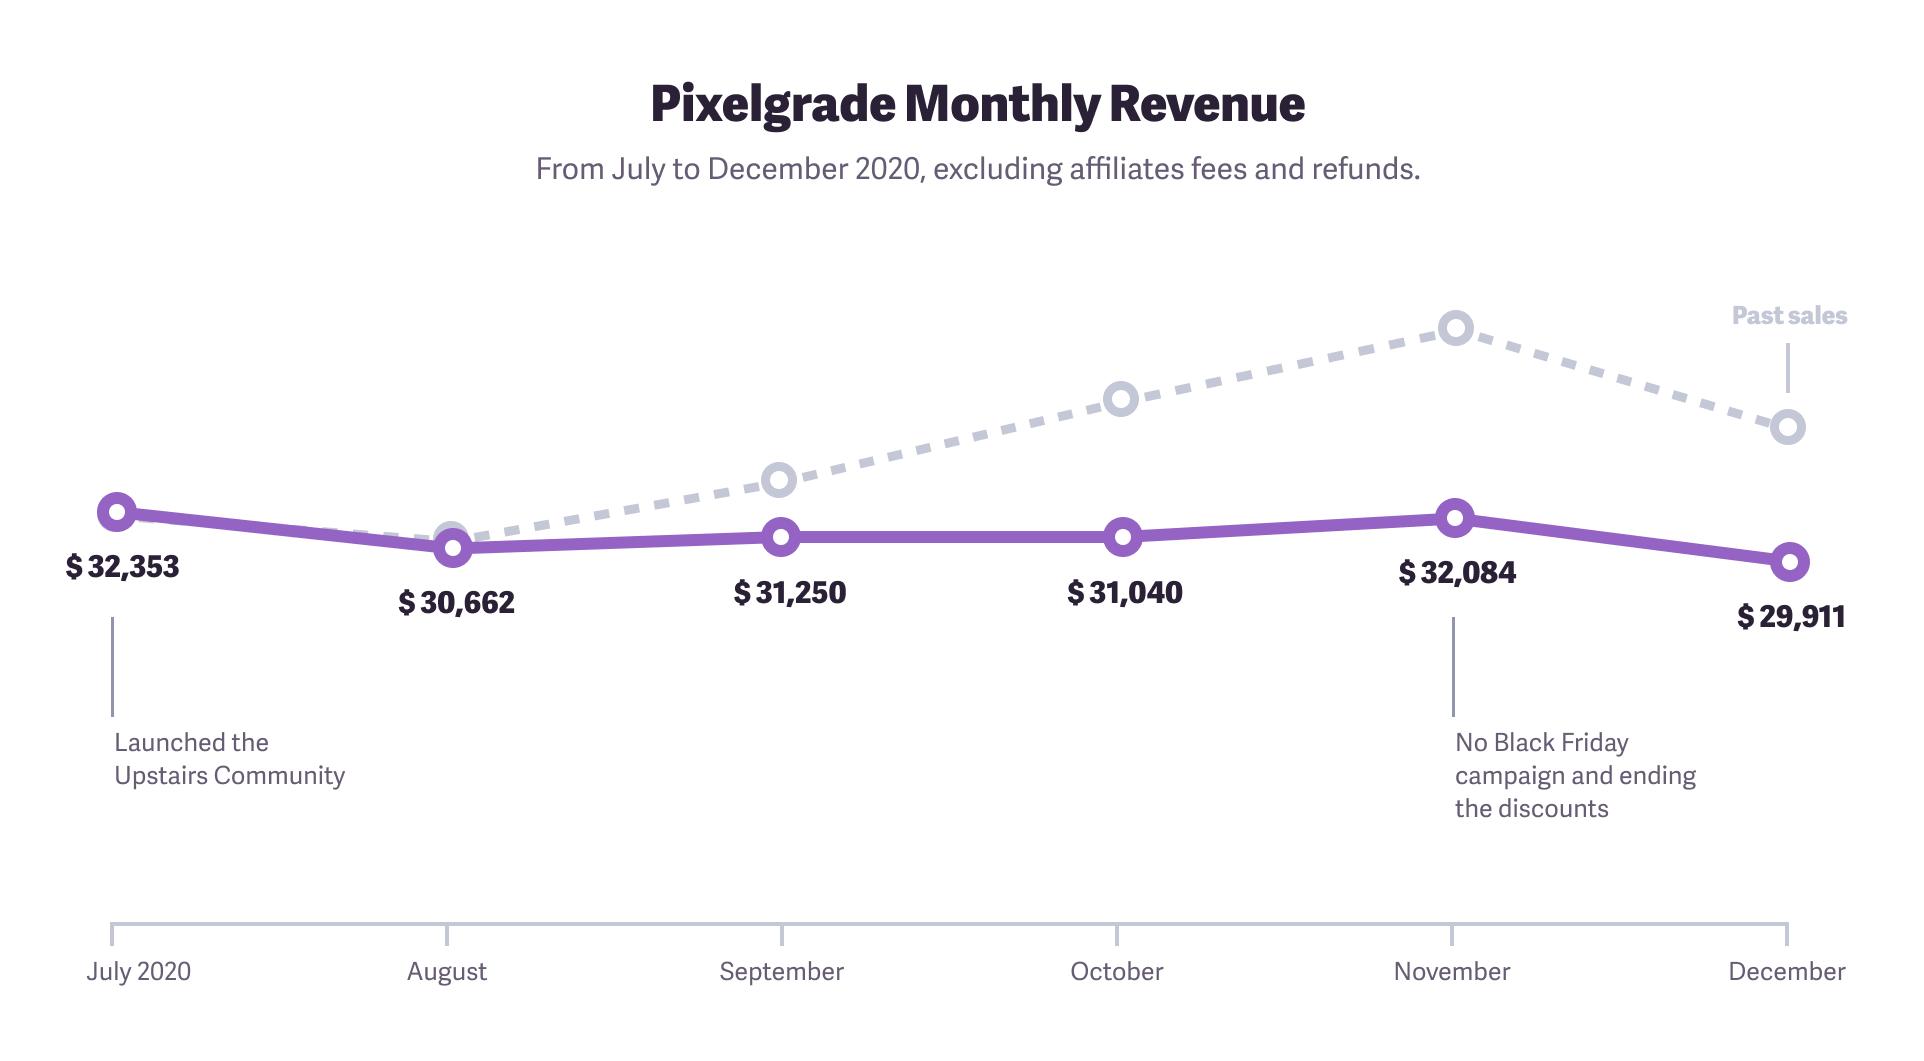 Pixelgrade monthly revenue evolution of the last months of 2020